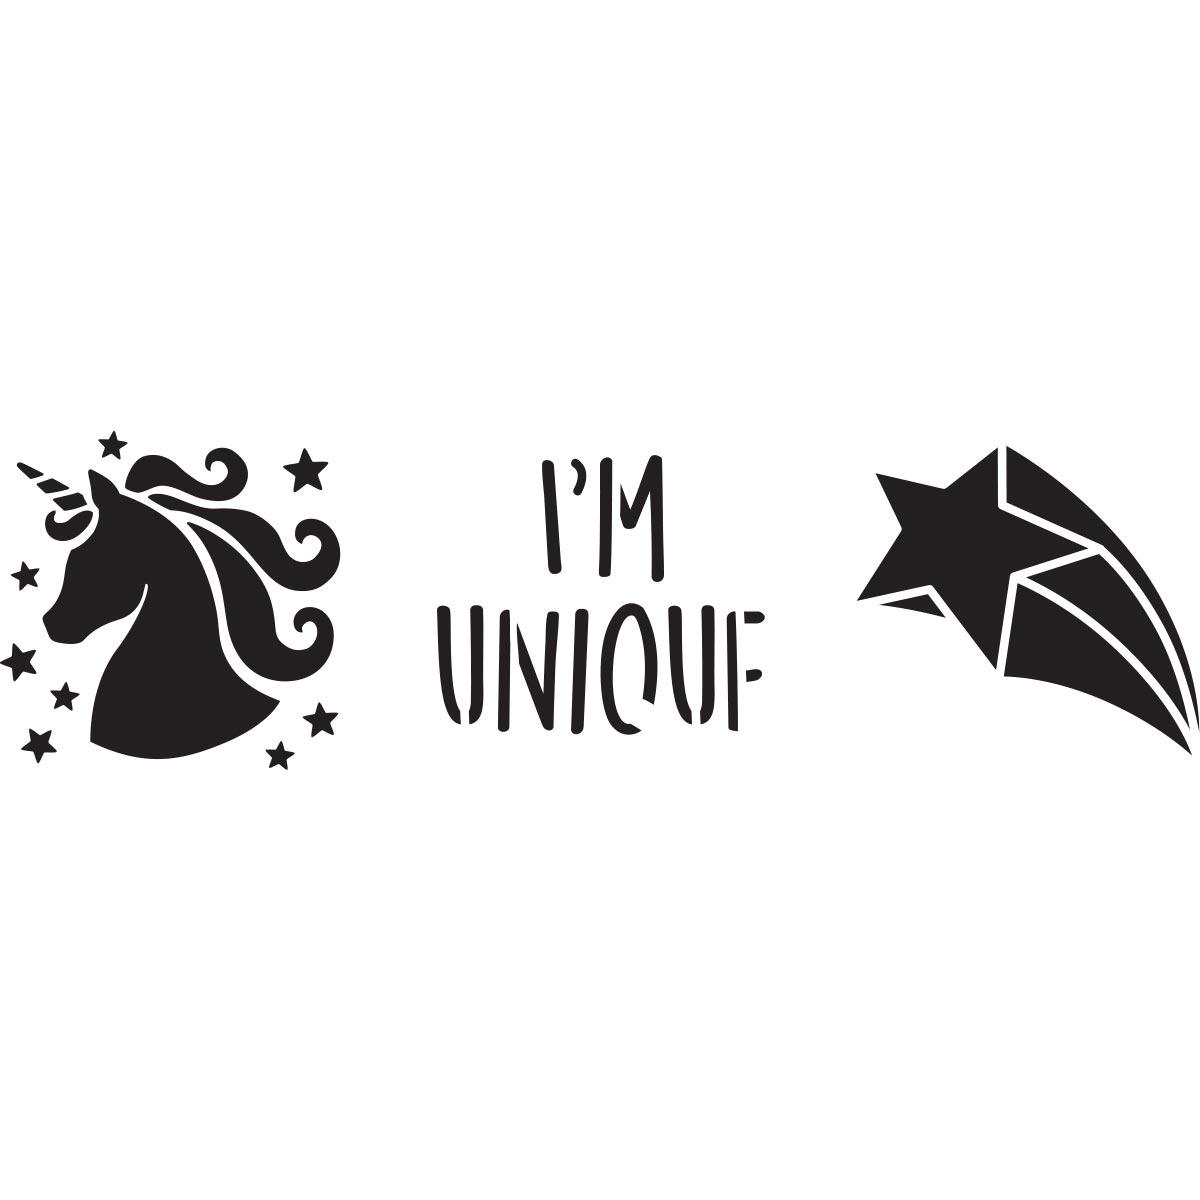 Fabric Creations™ Adhesive Stencils - Mini - Unicorn, 3